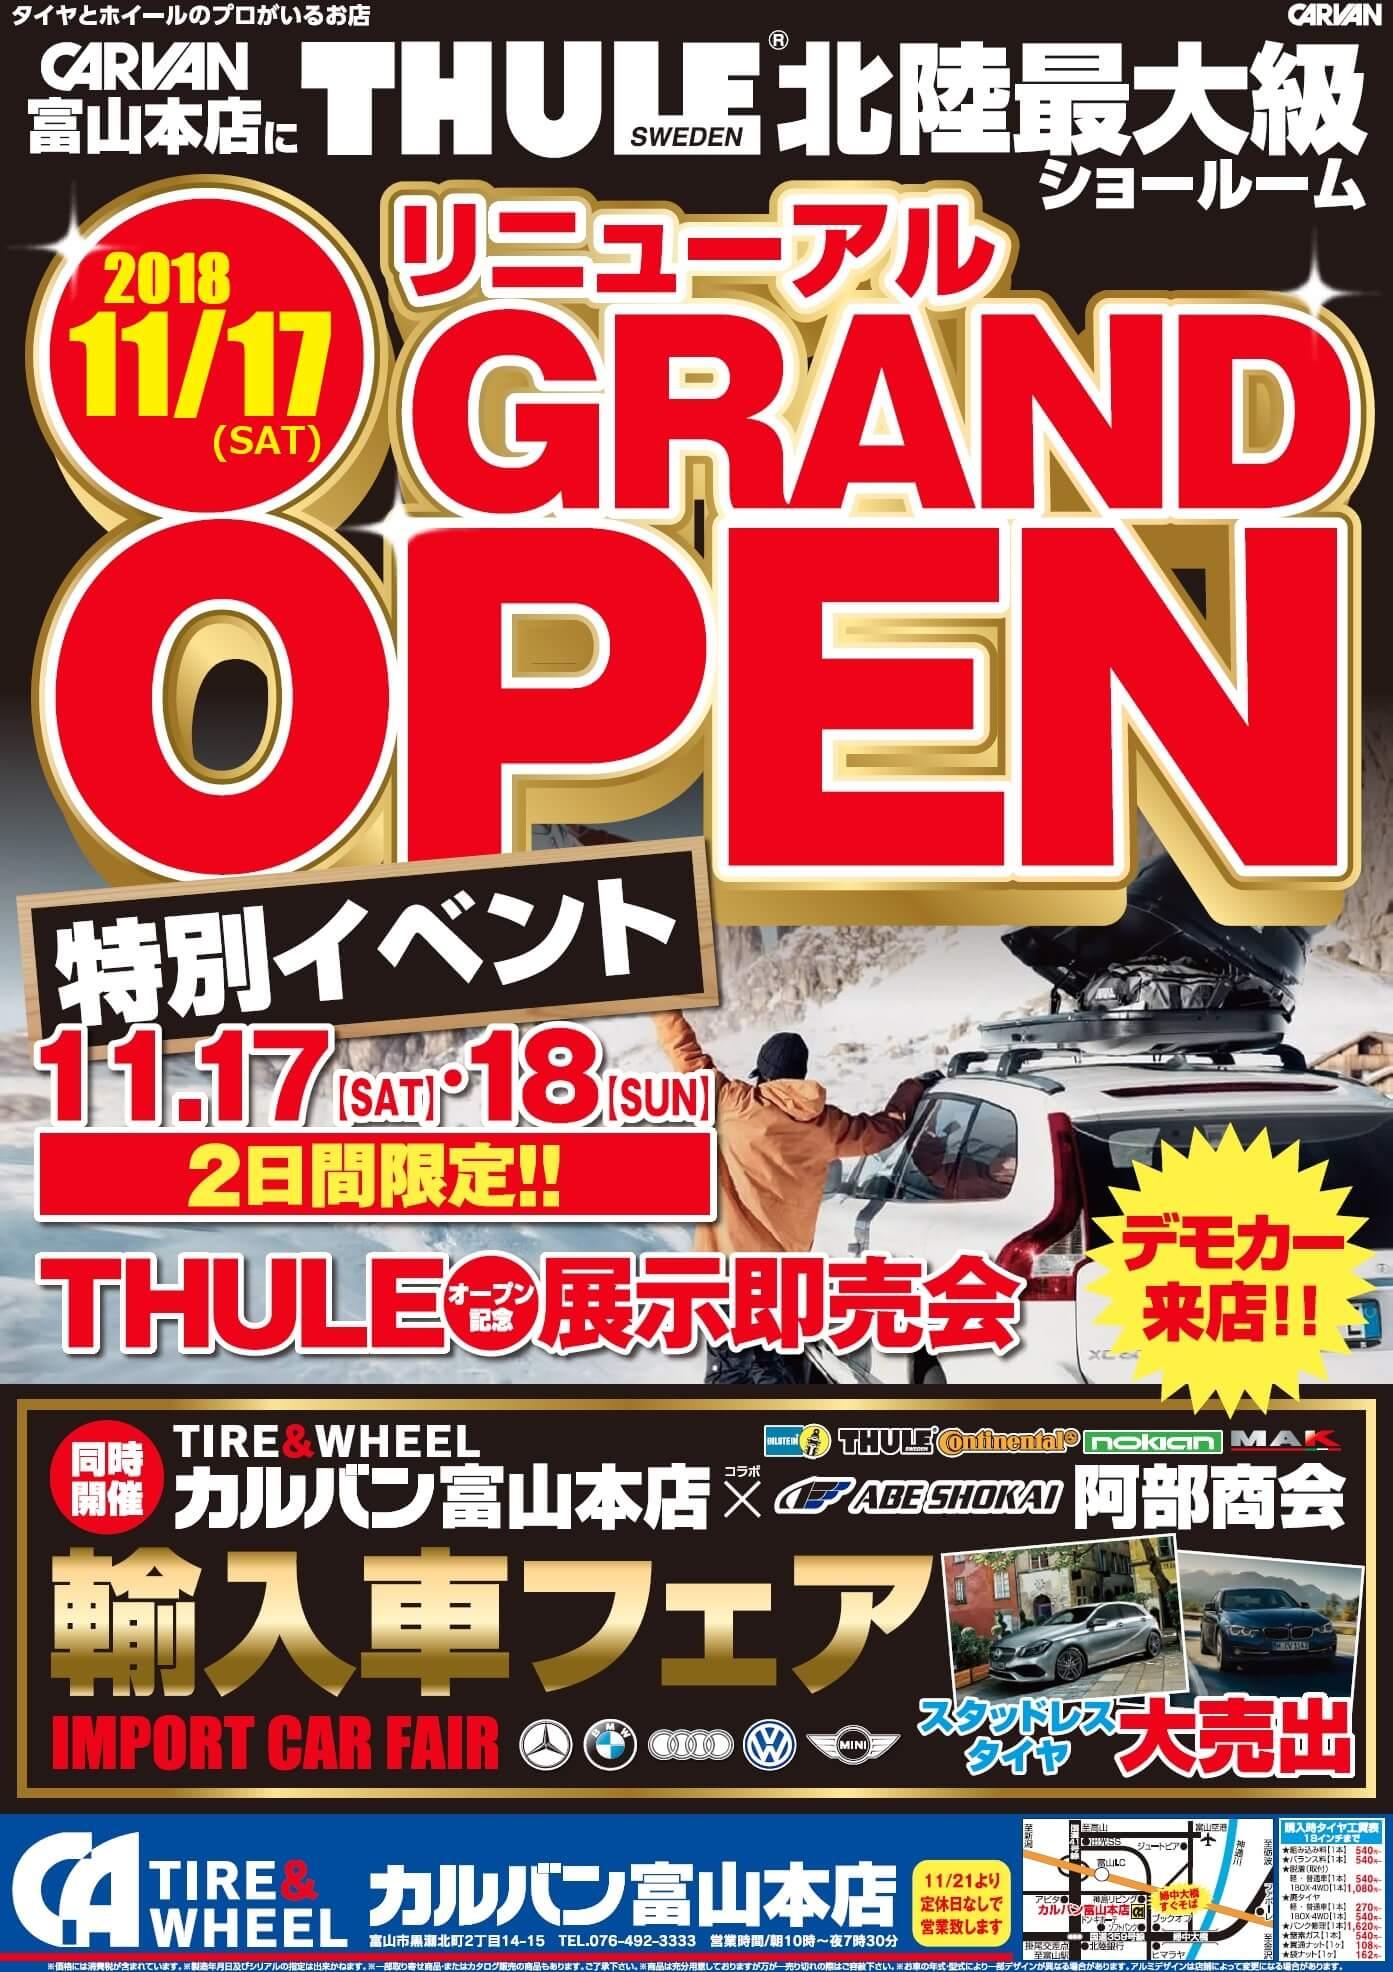 THULE・輸入車ホイール・NOKIAN/CONTINENTALスタッドレス商談会